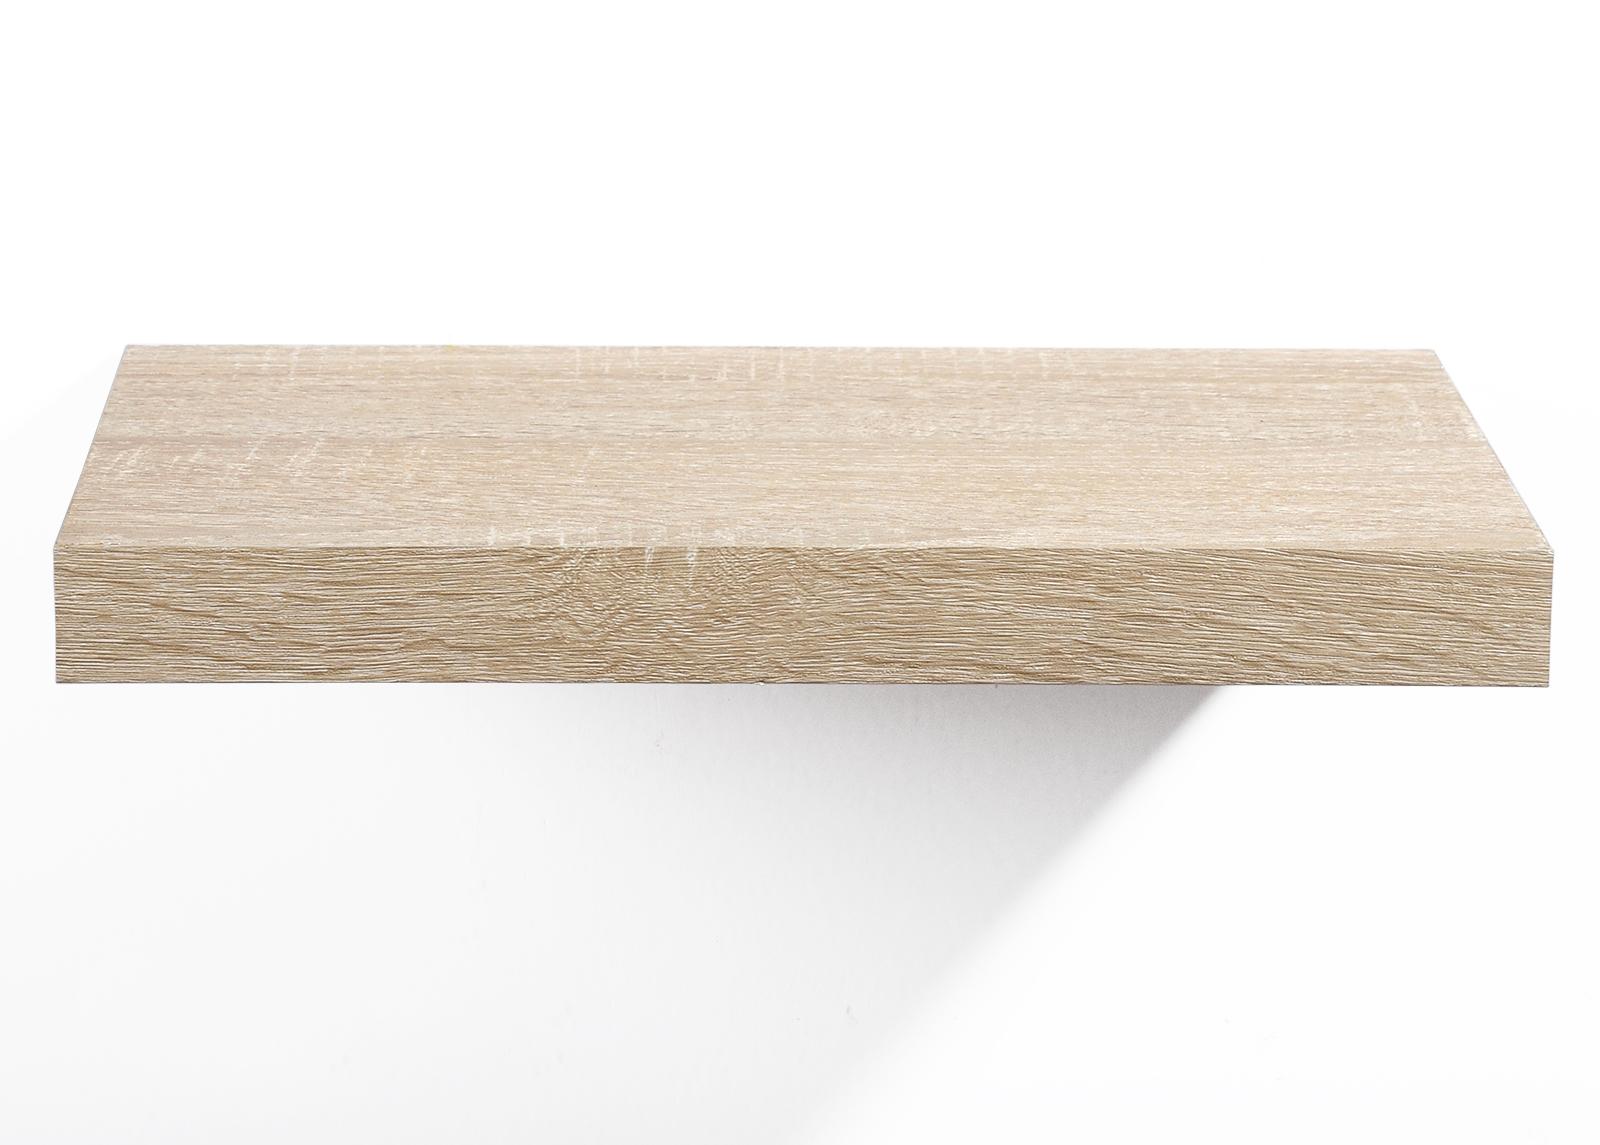 wandboard brett wandregal regal b cheregal h ngeregal holz farbwahl e 296 ebay. Black Bedroom Furniture Sets. Home Design Ideas